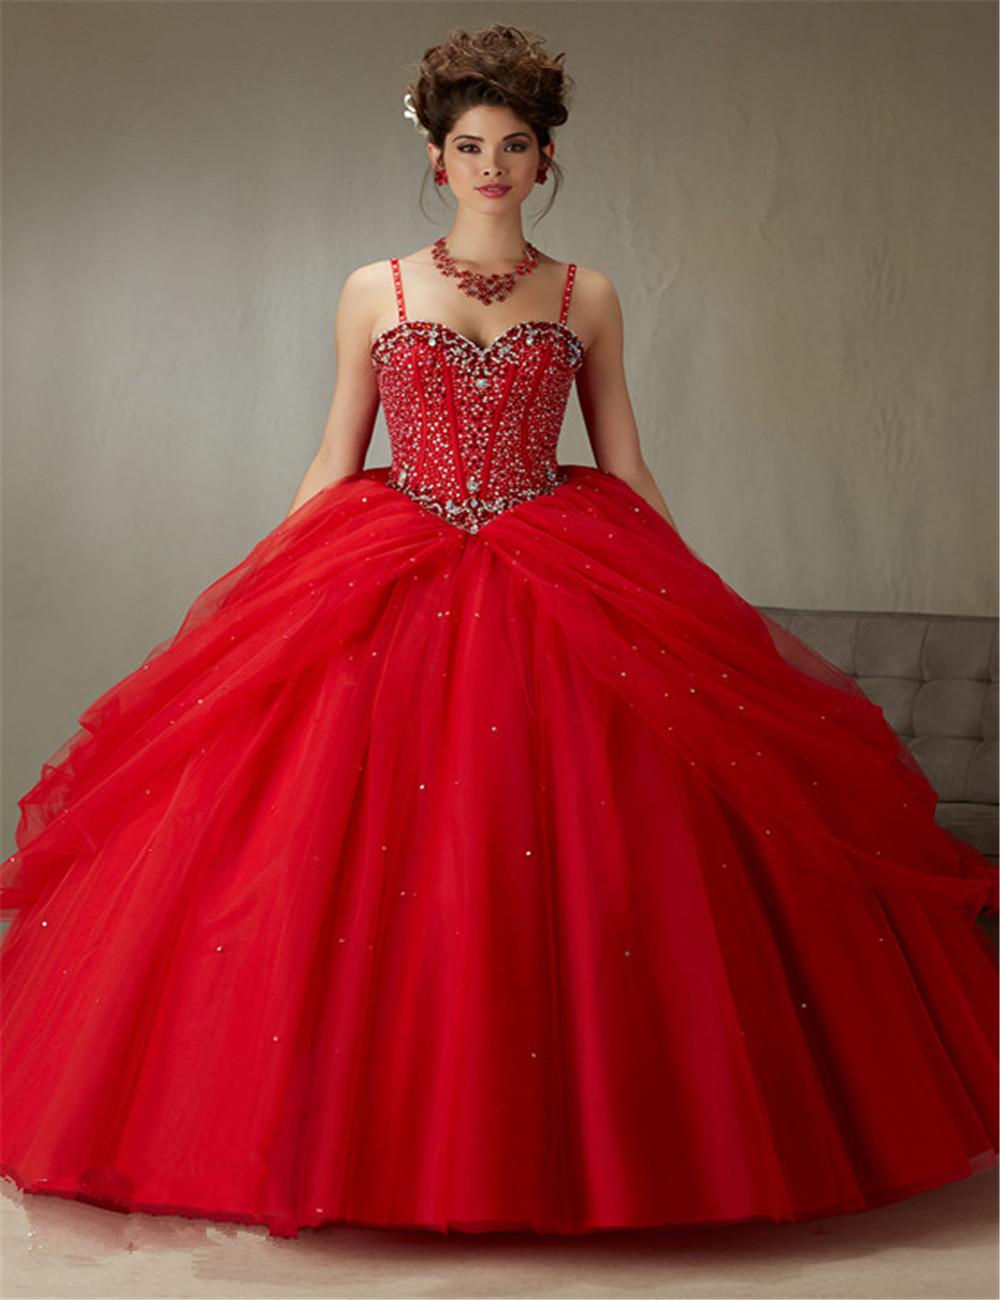 Vestidos xv anos color rojo 21 ideas para fiestas de for Ornamentacion de 15 anos